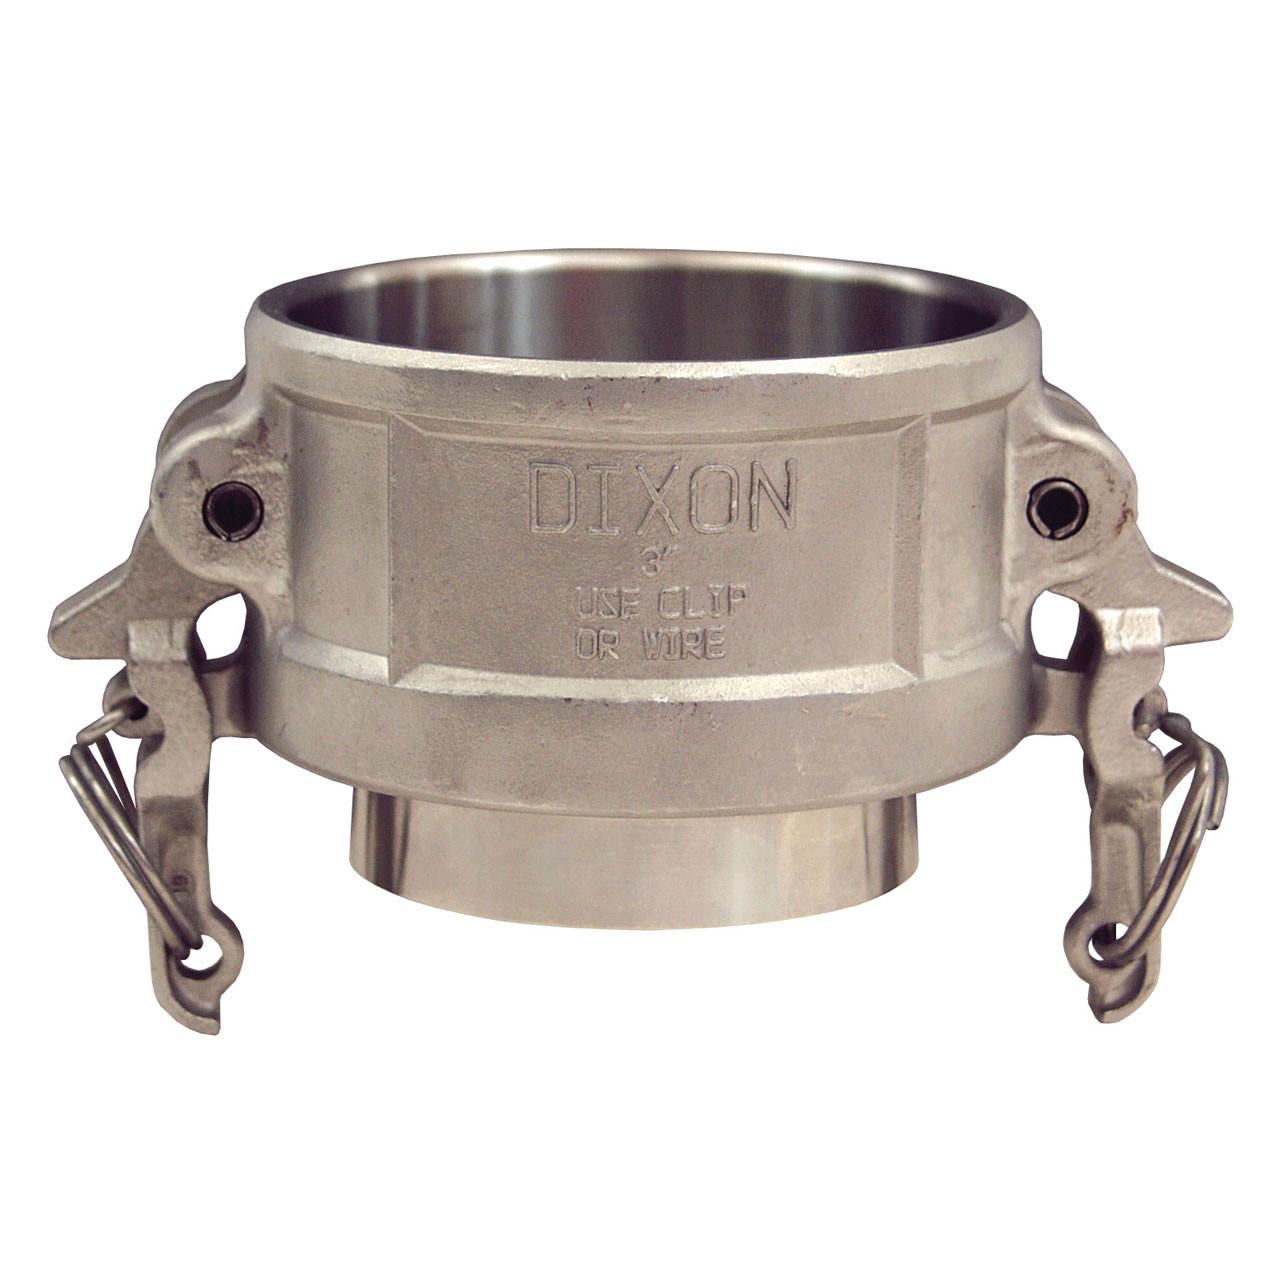 Cam Tube dixon sanitary boss-lock 316ss cam & groove coupler x butt weld to tube end